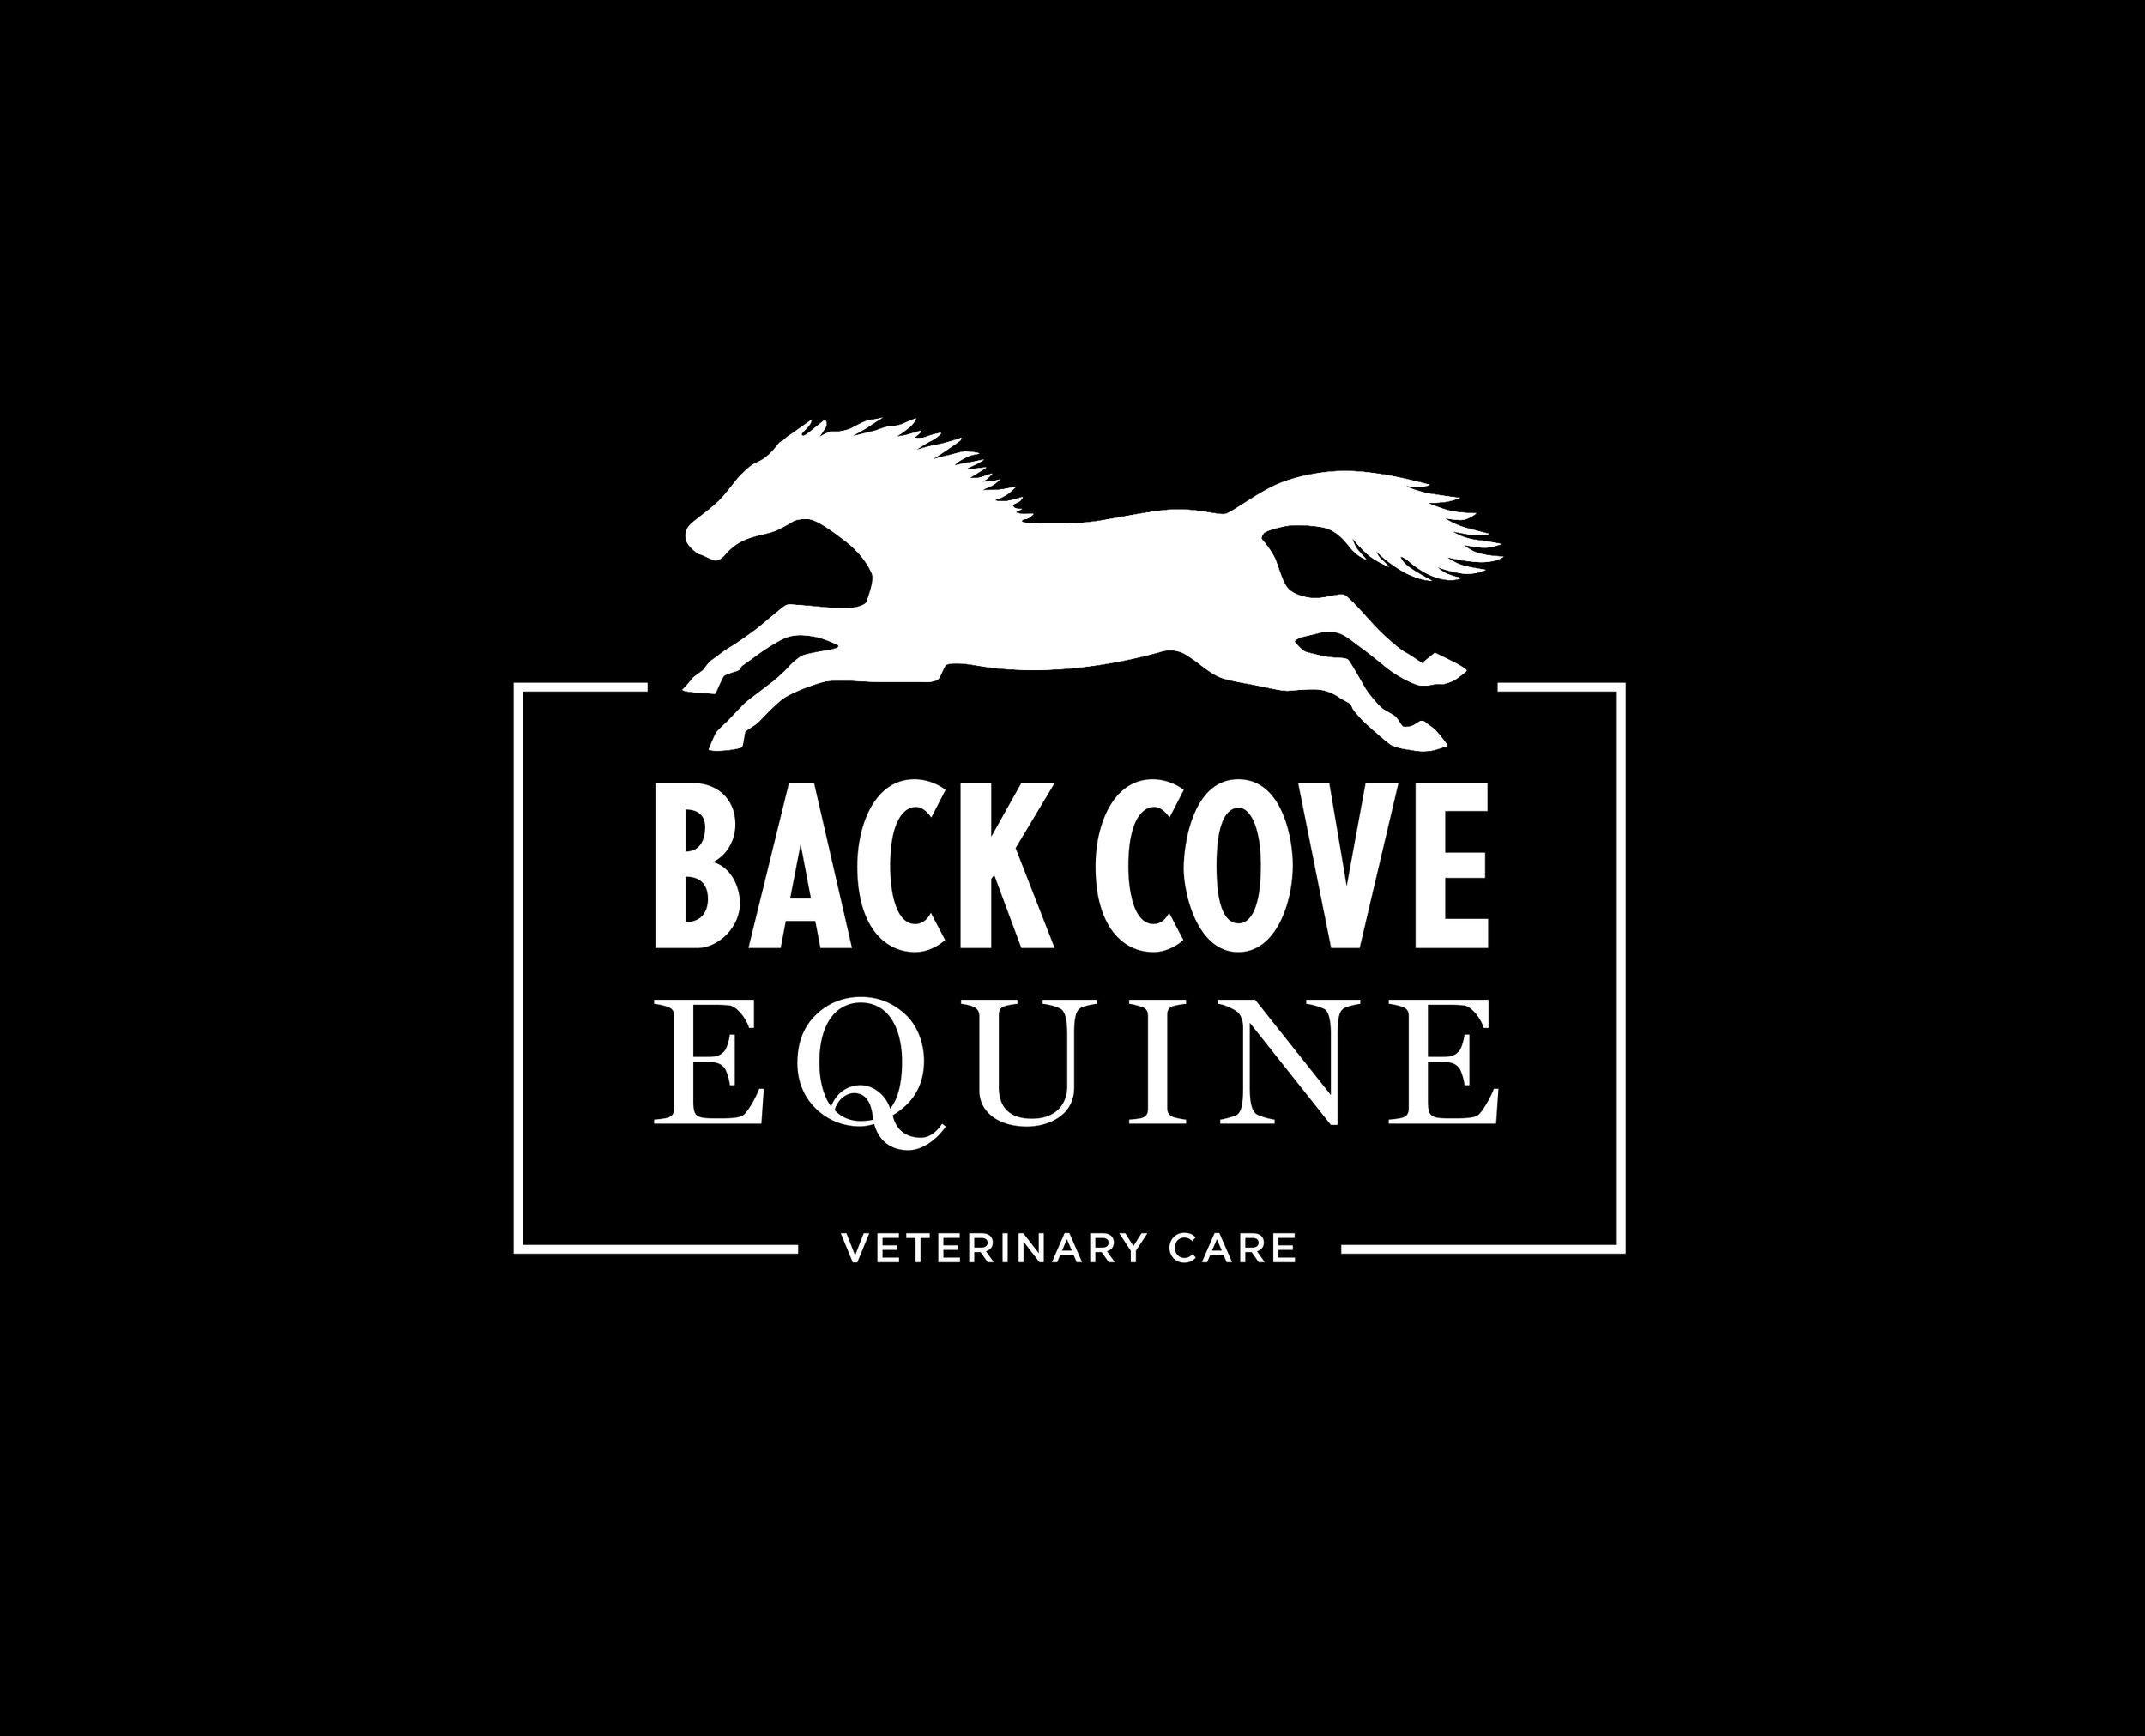 Back Cove Equine